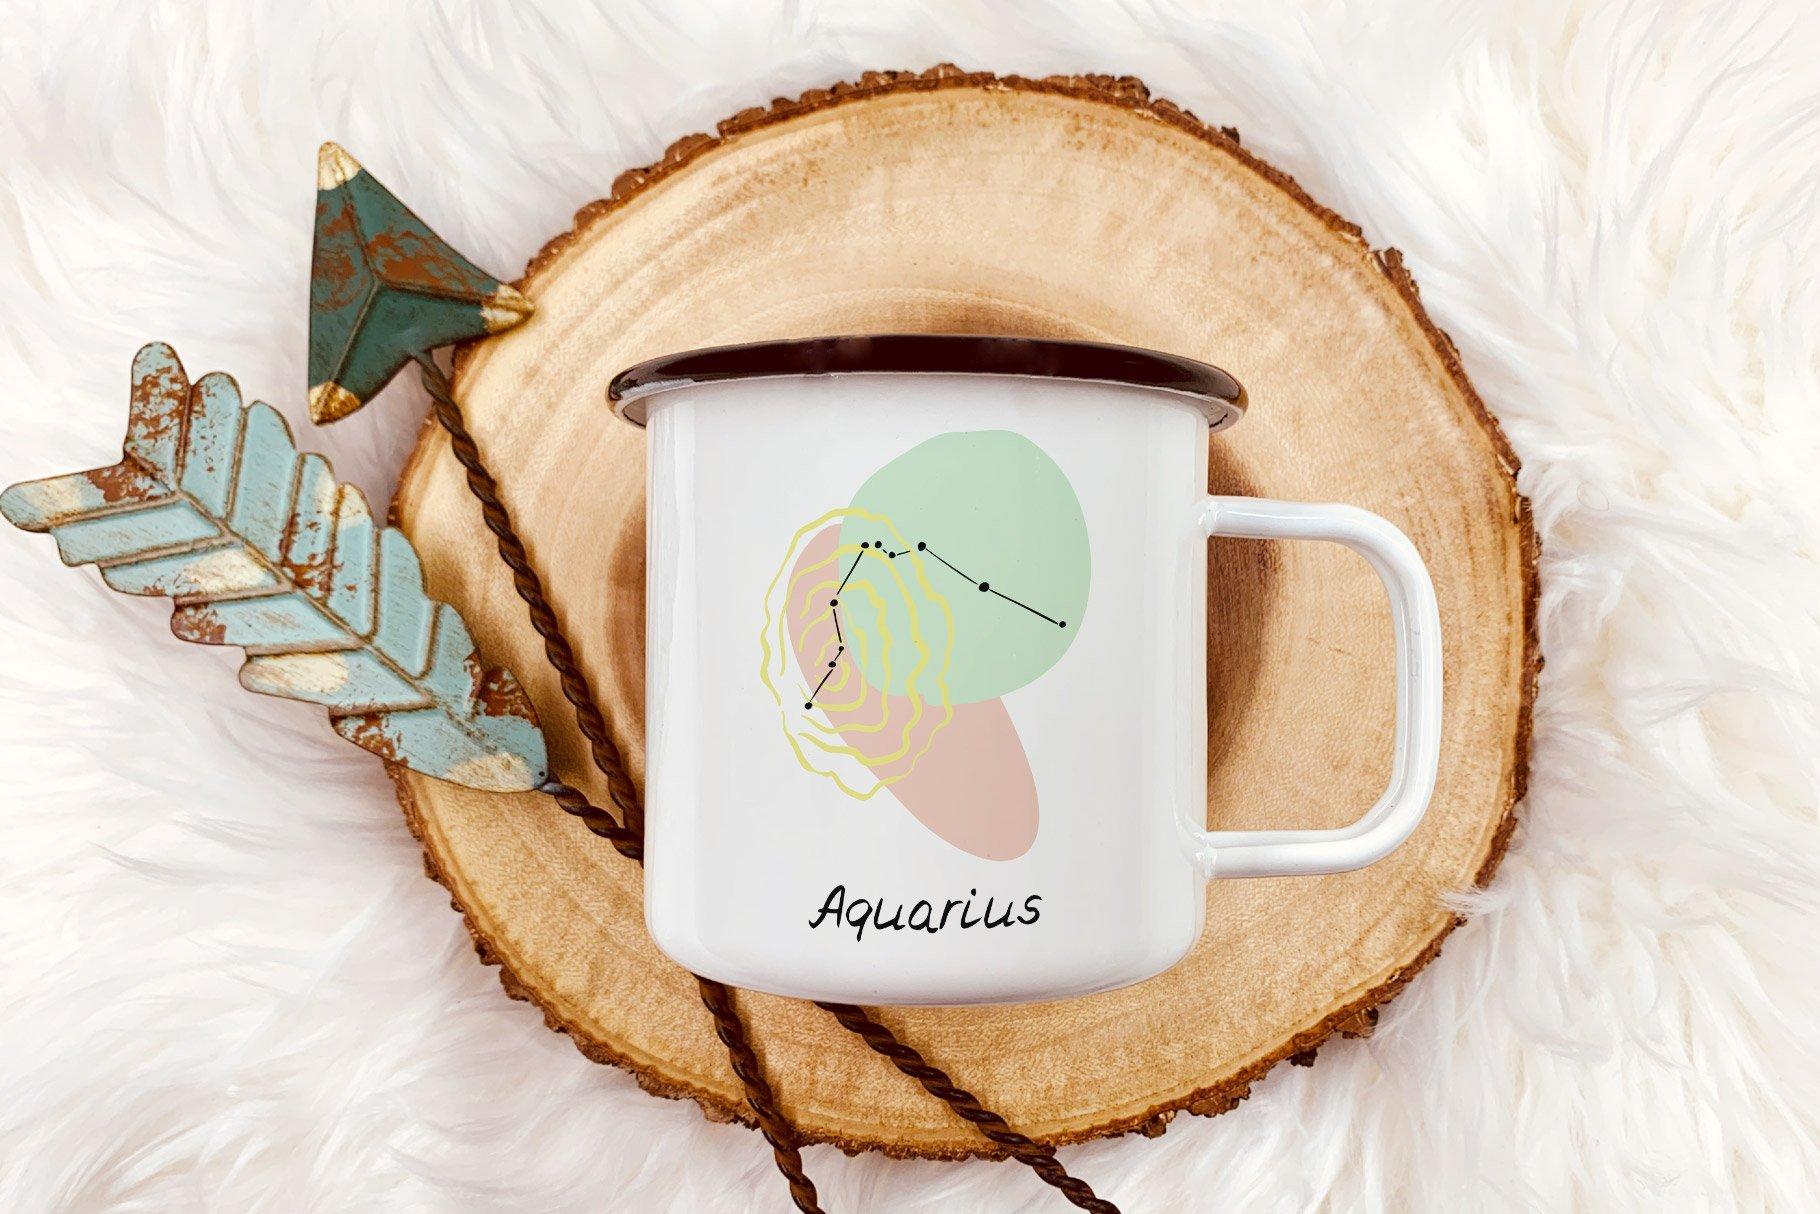 Mug Made On The Abstrac Zodiac Signs Vector Illustration.